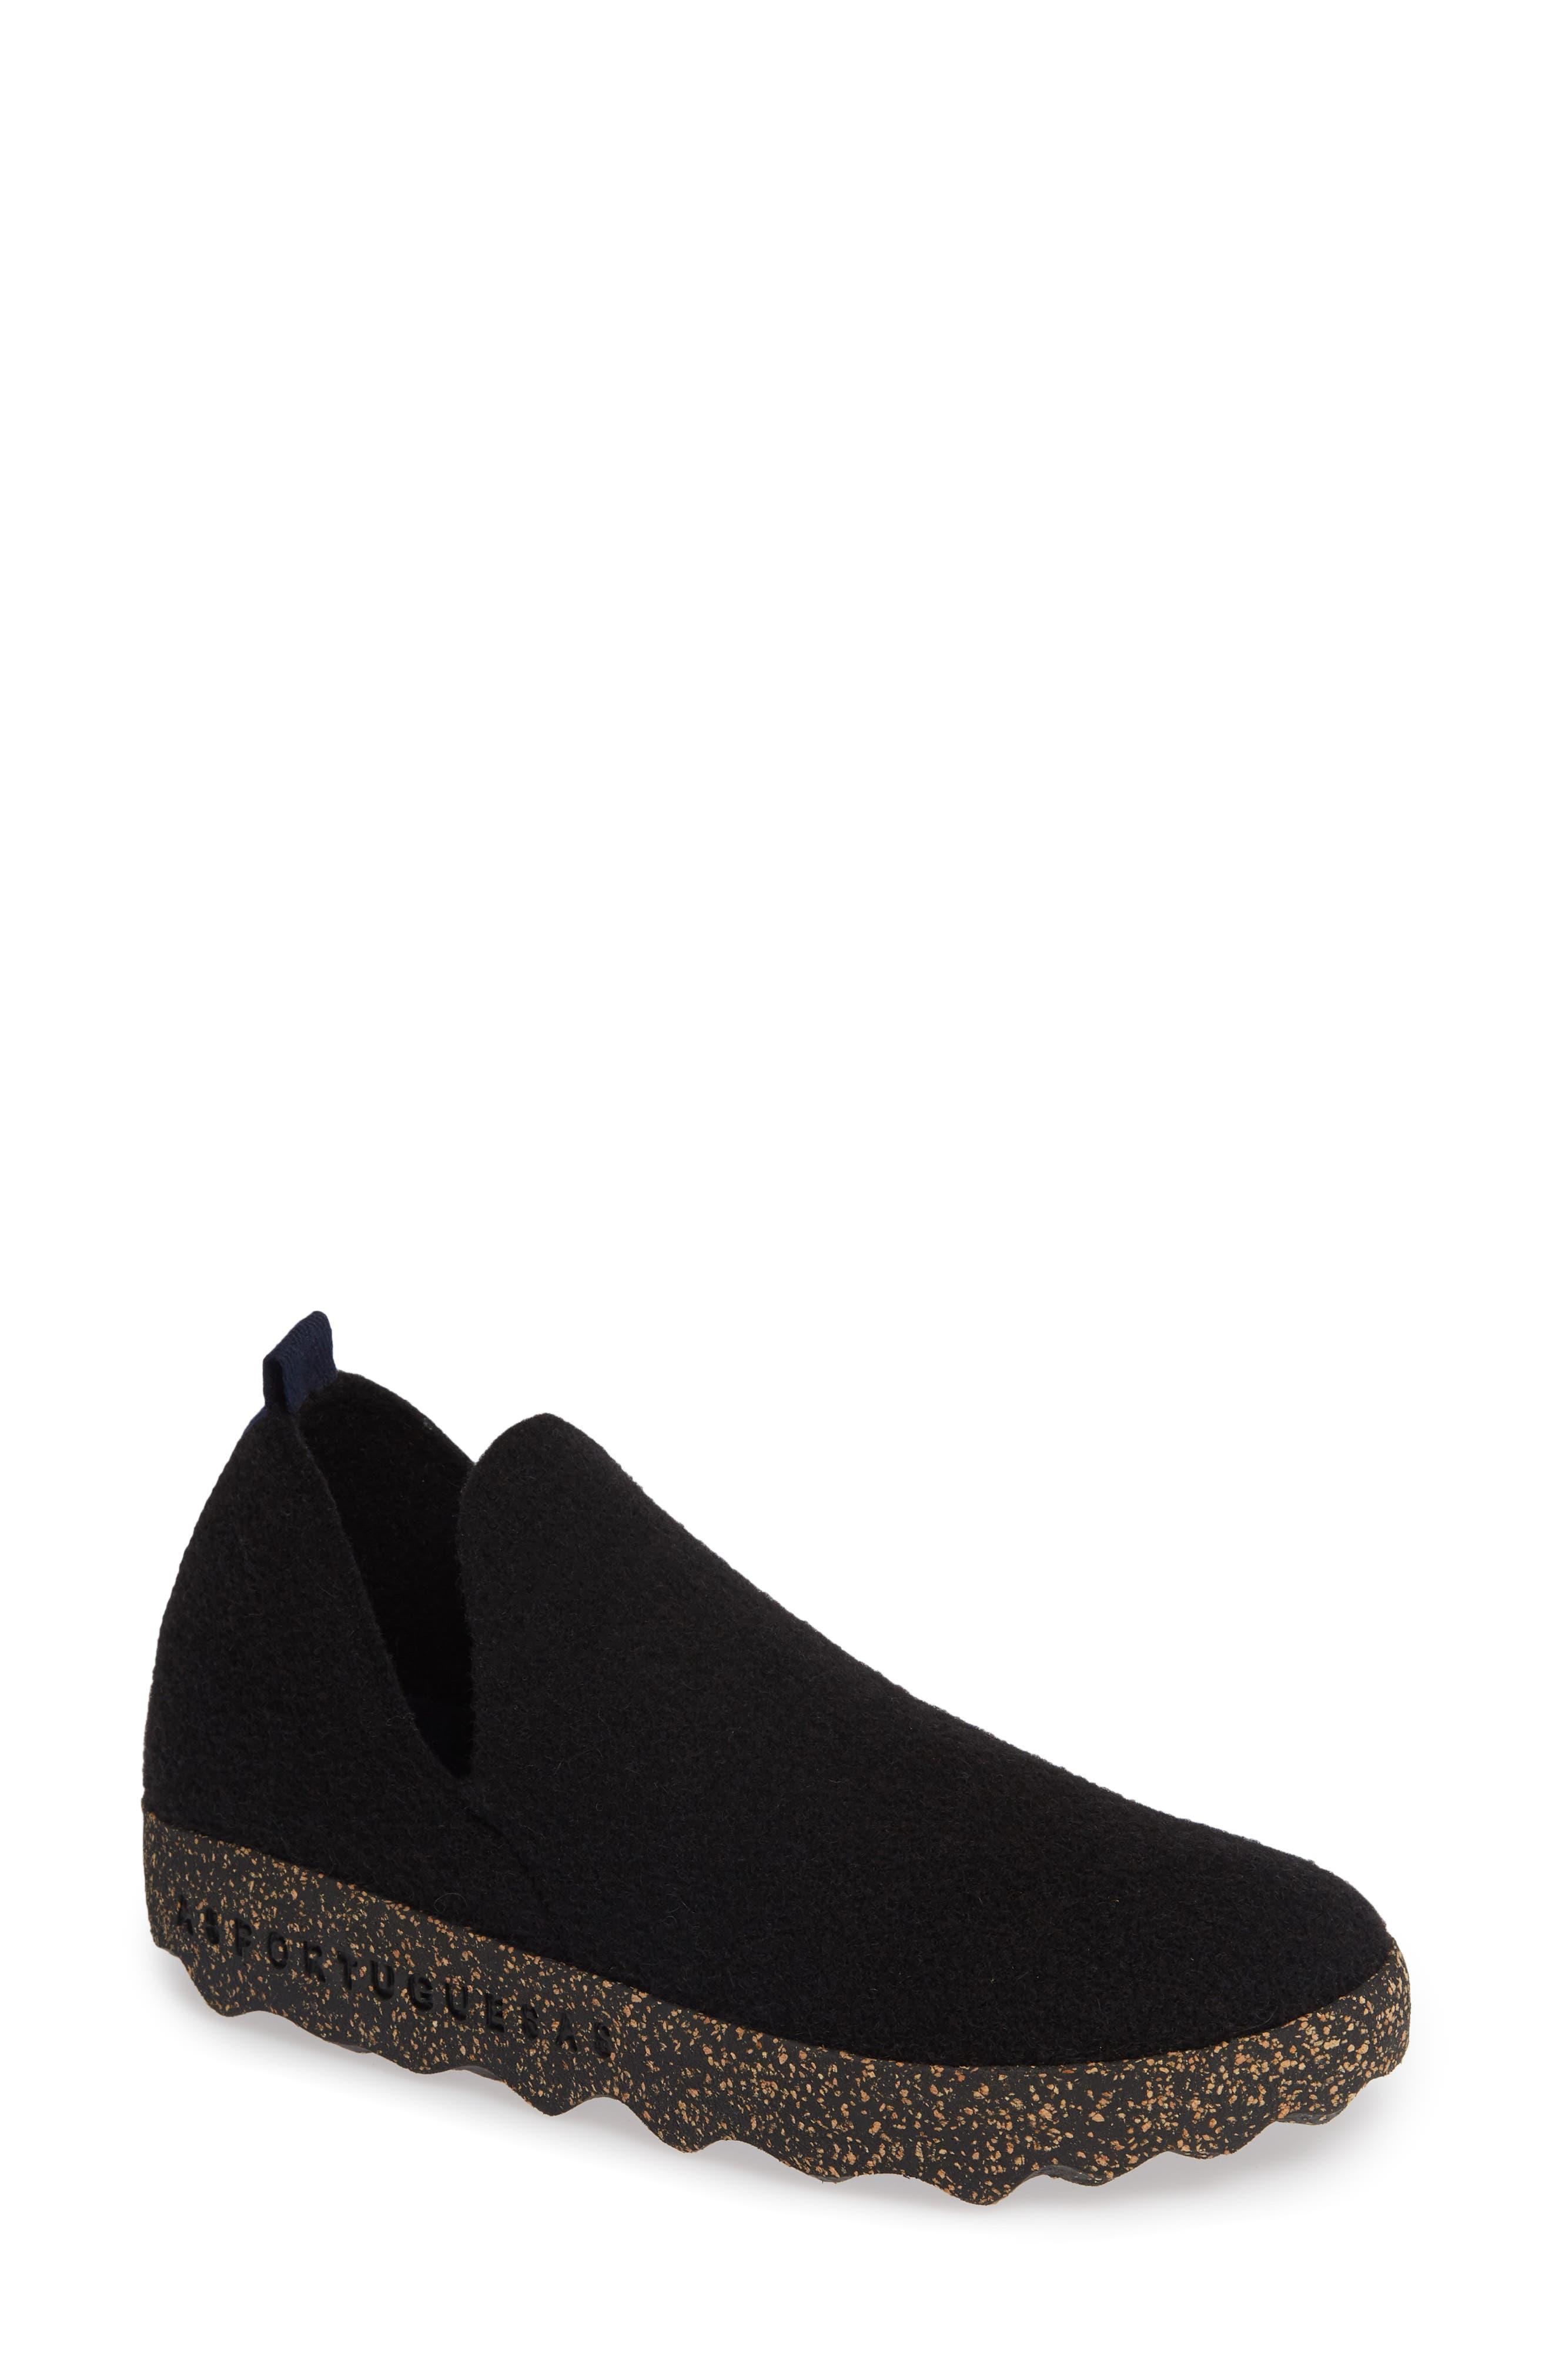 Asportuguesas By Fly London City Sneaker, Black